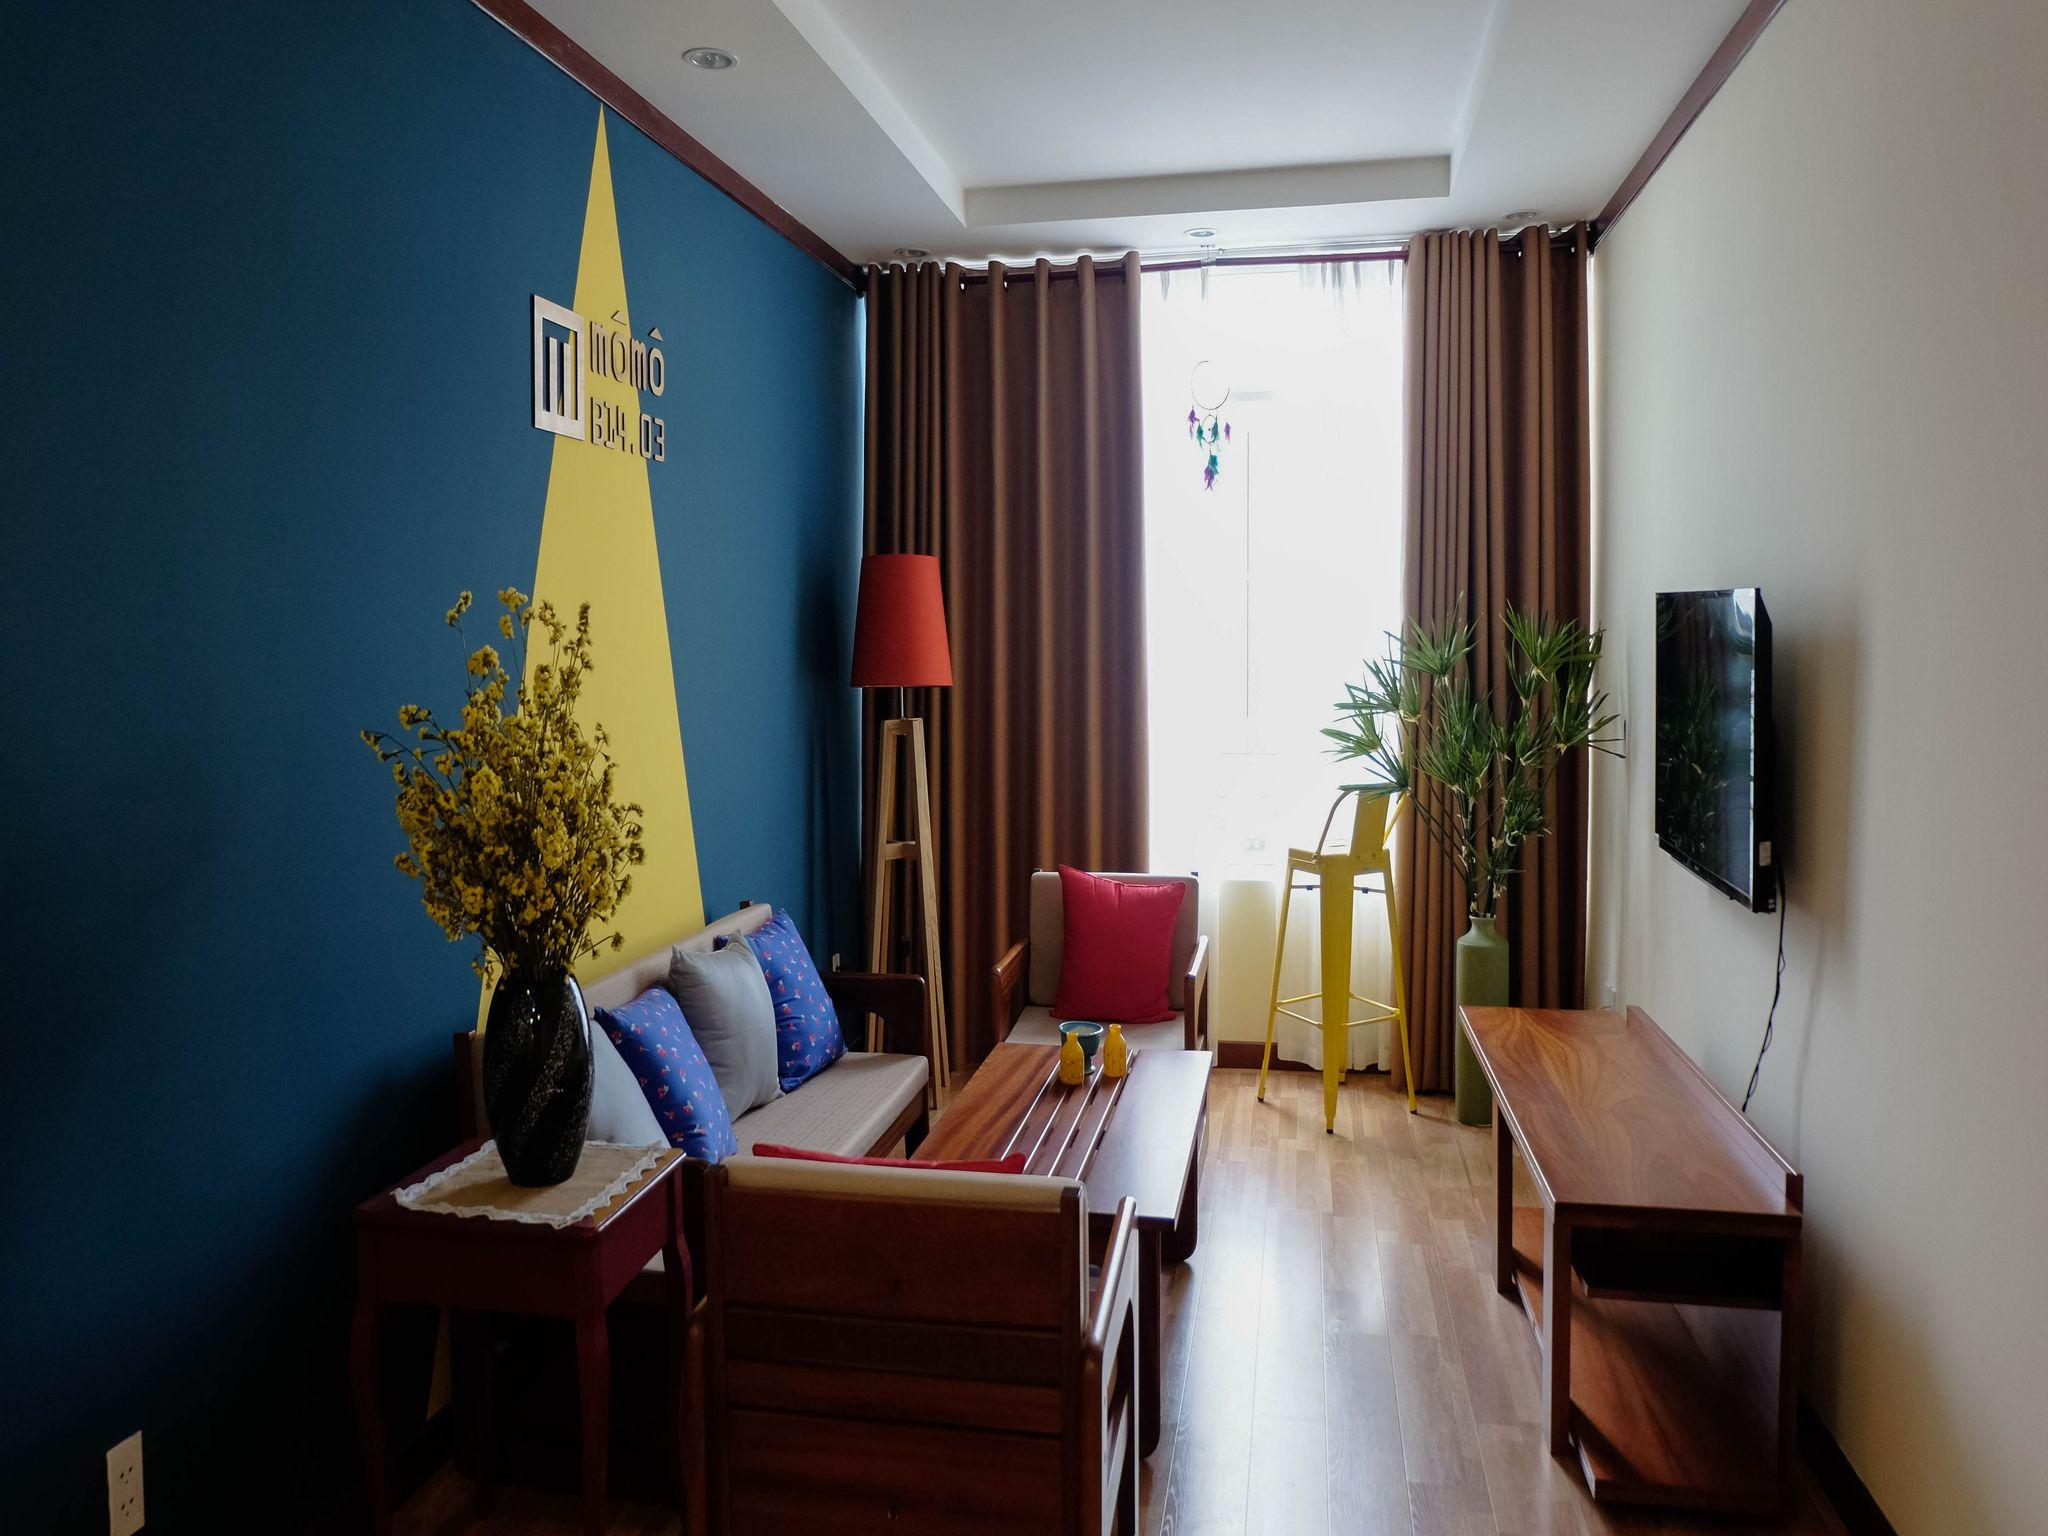 Momo B14.03 Apartment  Hoang Anh Gia Lai